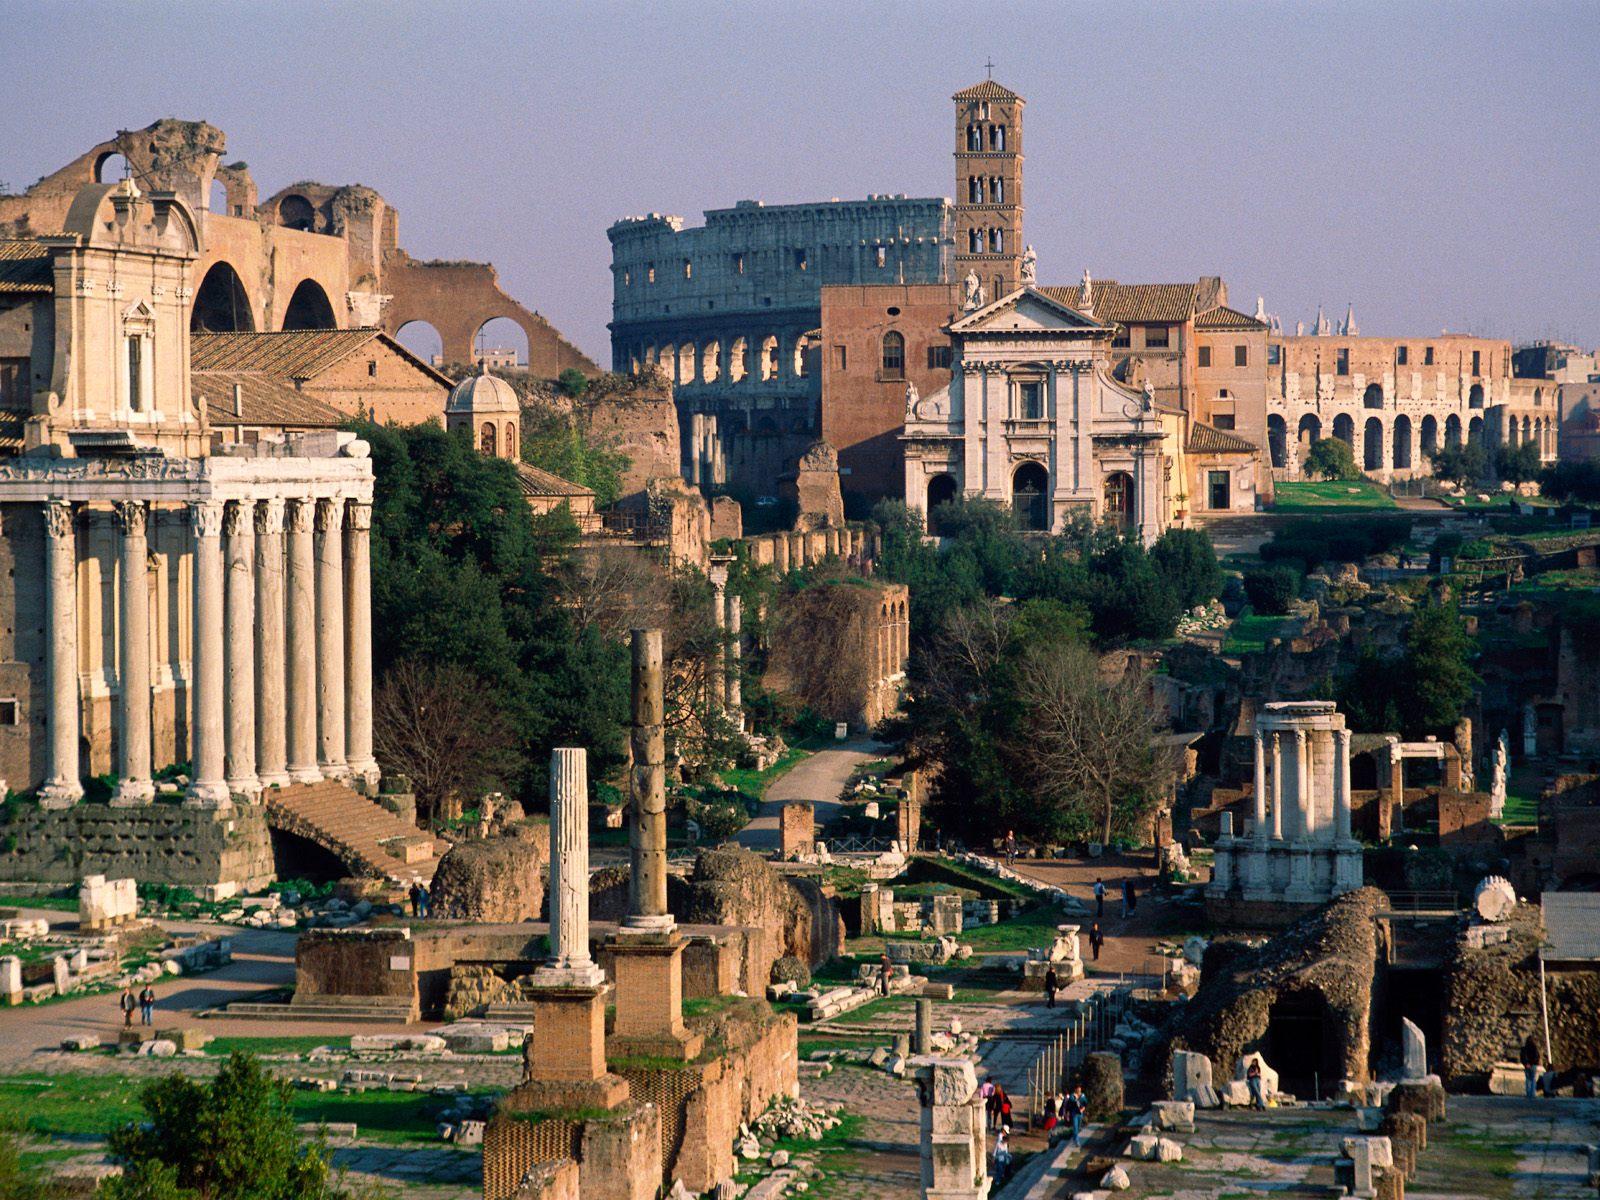 http://1.bp.blogspot.com/-zjYs2sp-APs/Tcp4c9AabNI/AAAAAAAACXs/nwK2jRwQ4z8/s1600/Roman+Forum%252C+Rome%252C+Italy.jpg